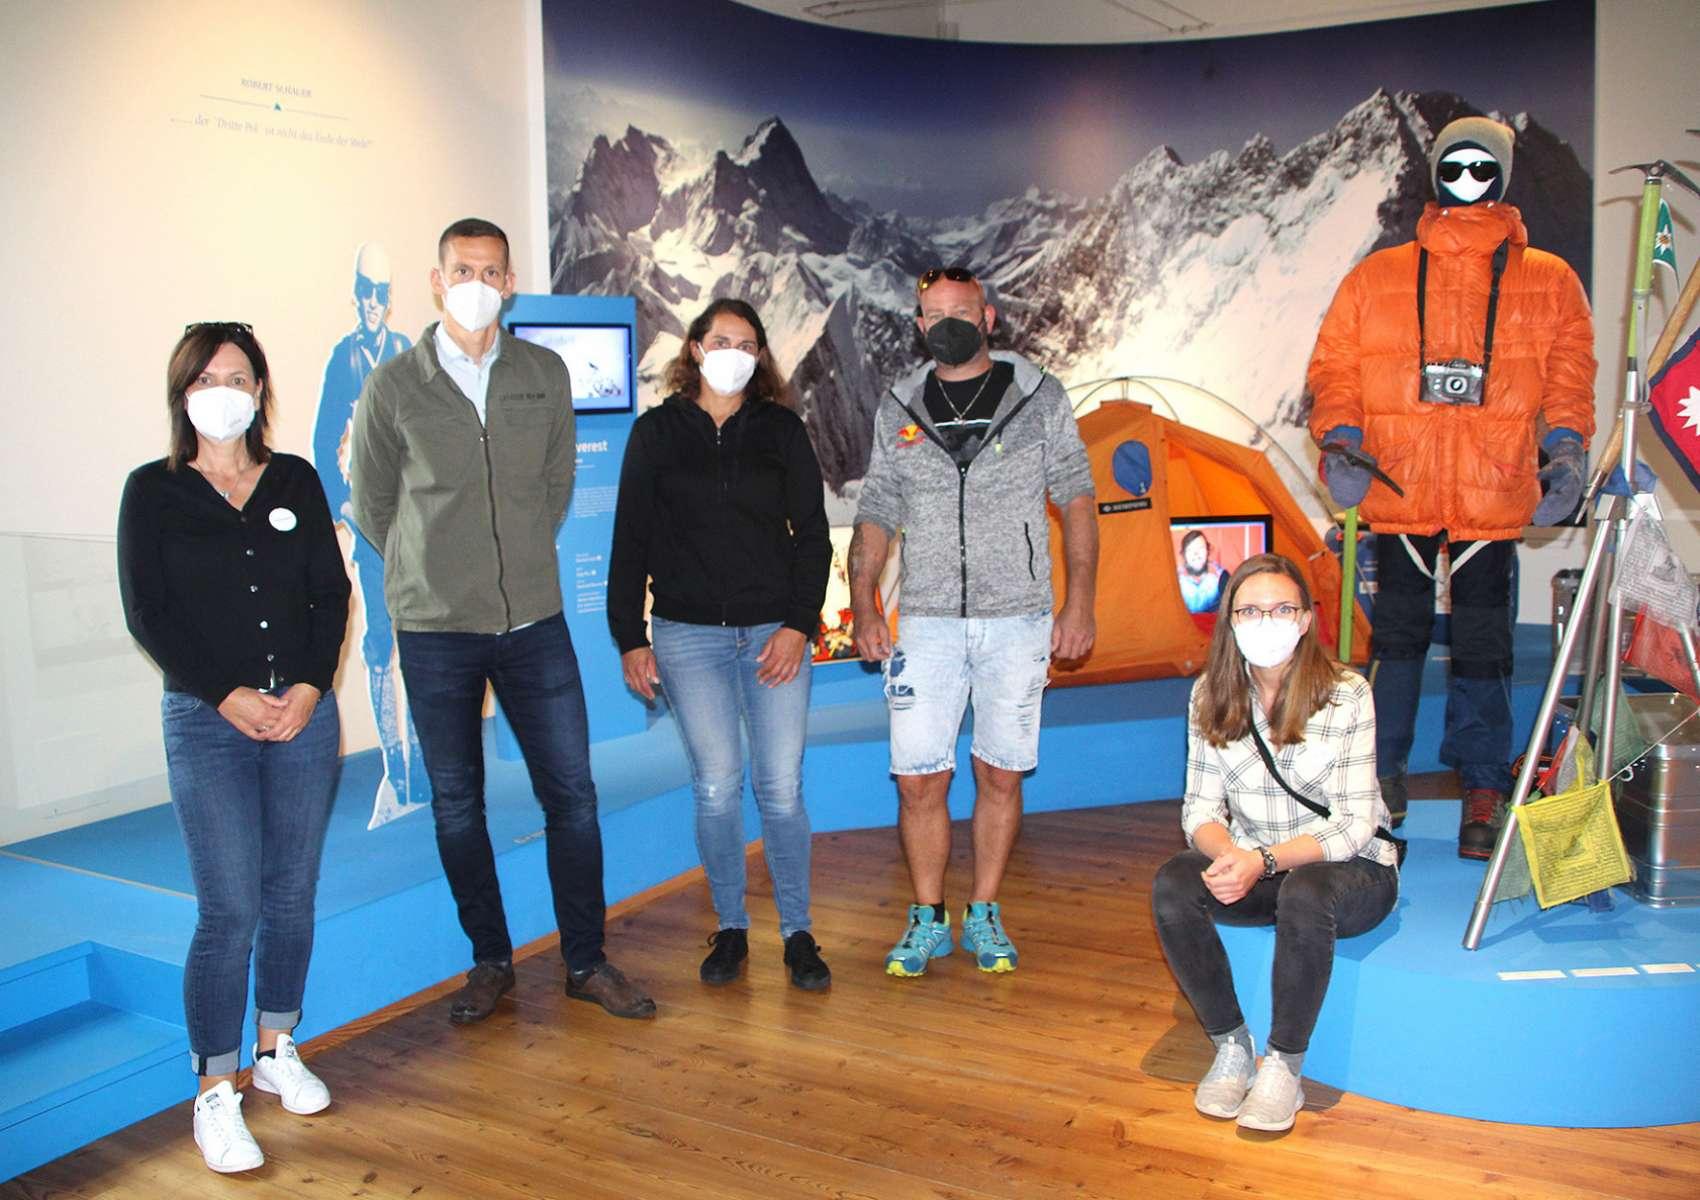 Museum Schloss Trautenfels: Auf Gipfelstürmen folgt Heilkunde